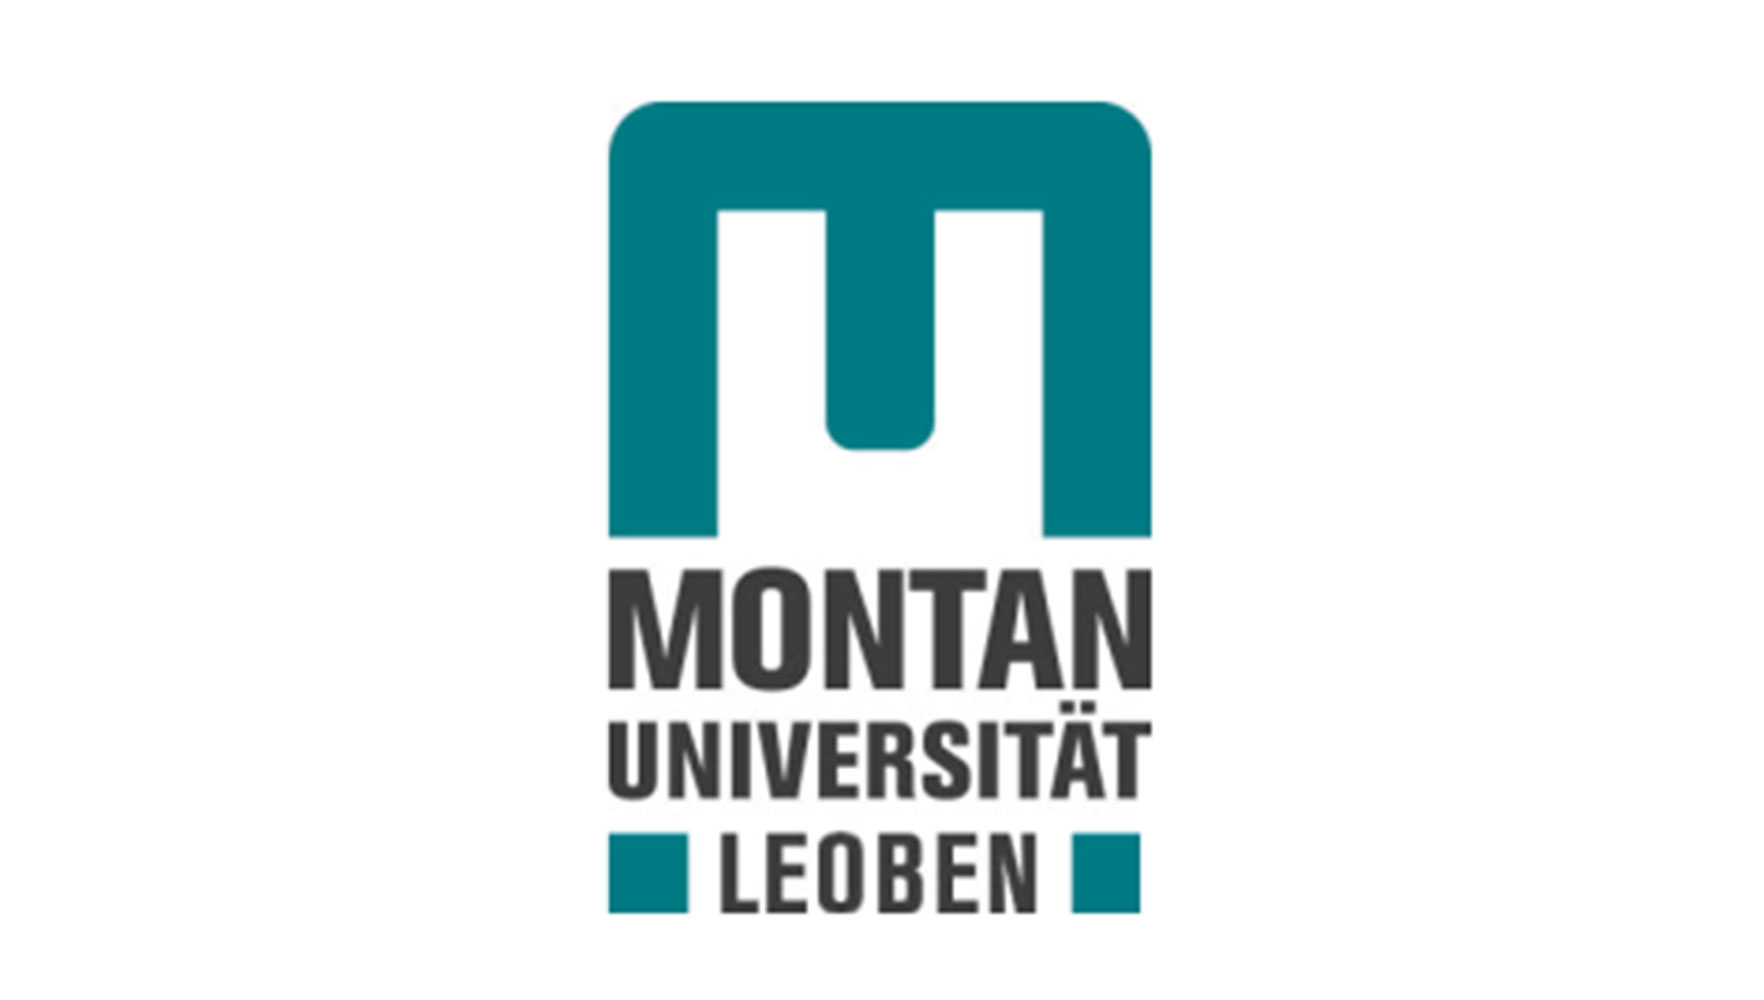 pic_logo_montanuni_leoben